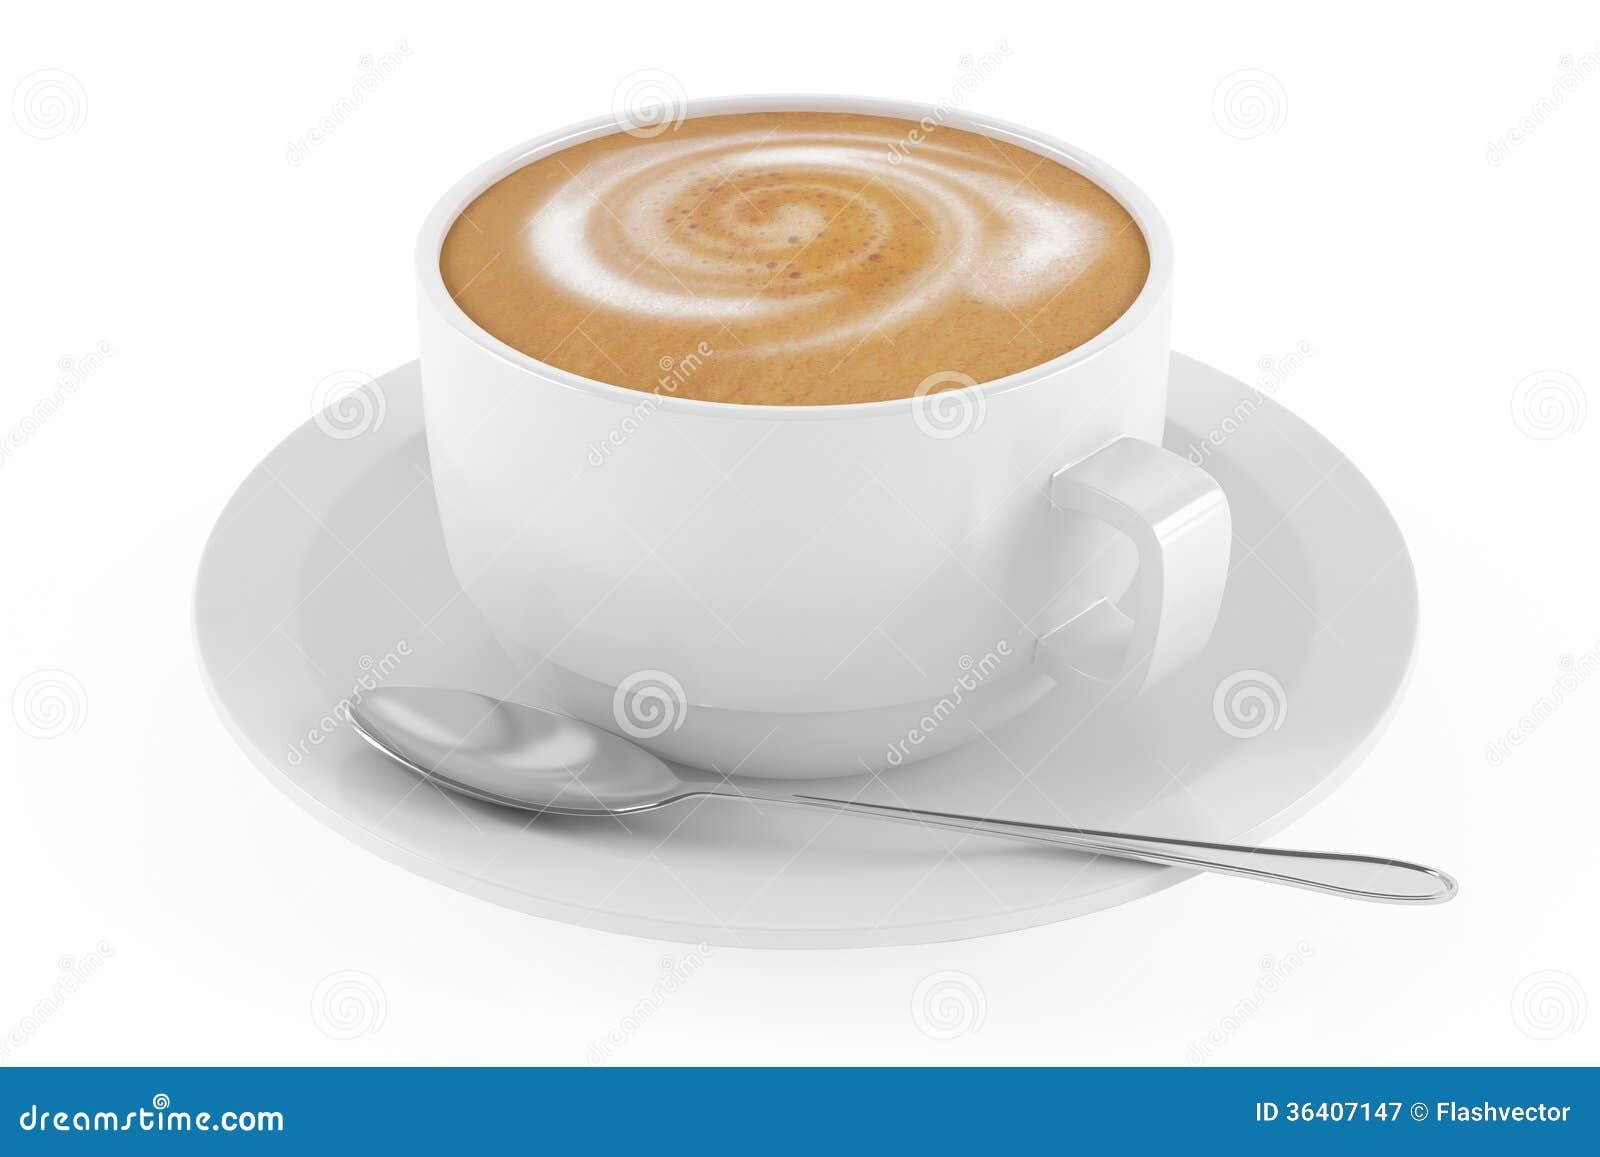 hot coffee white background - photo #18